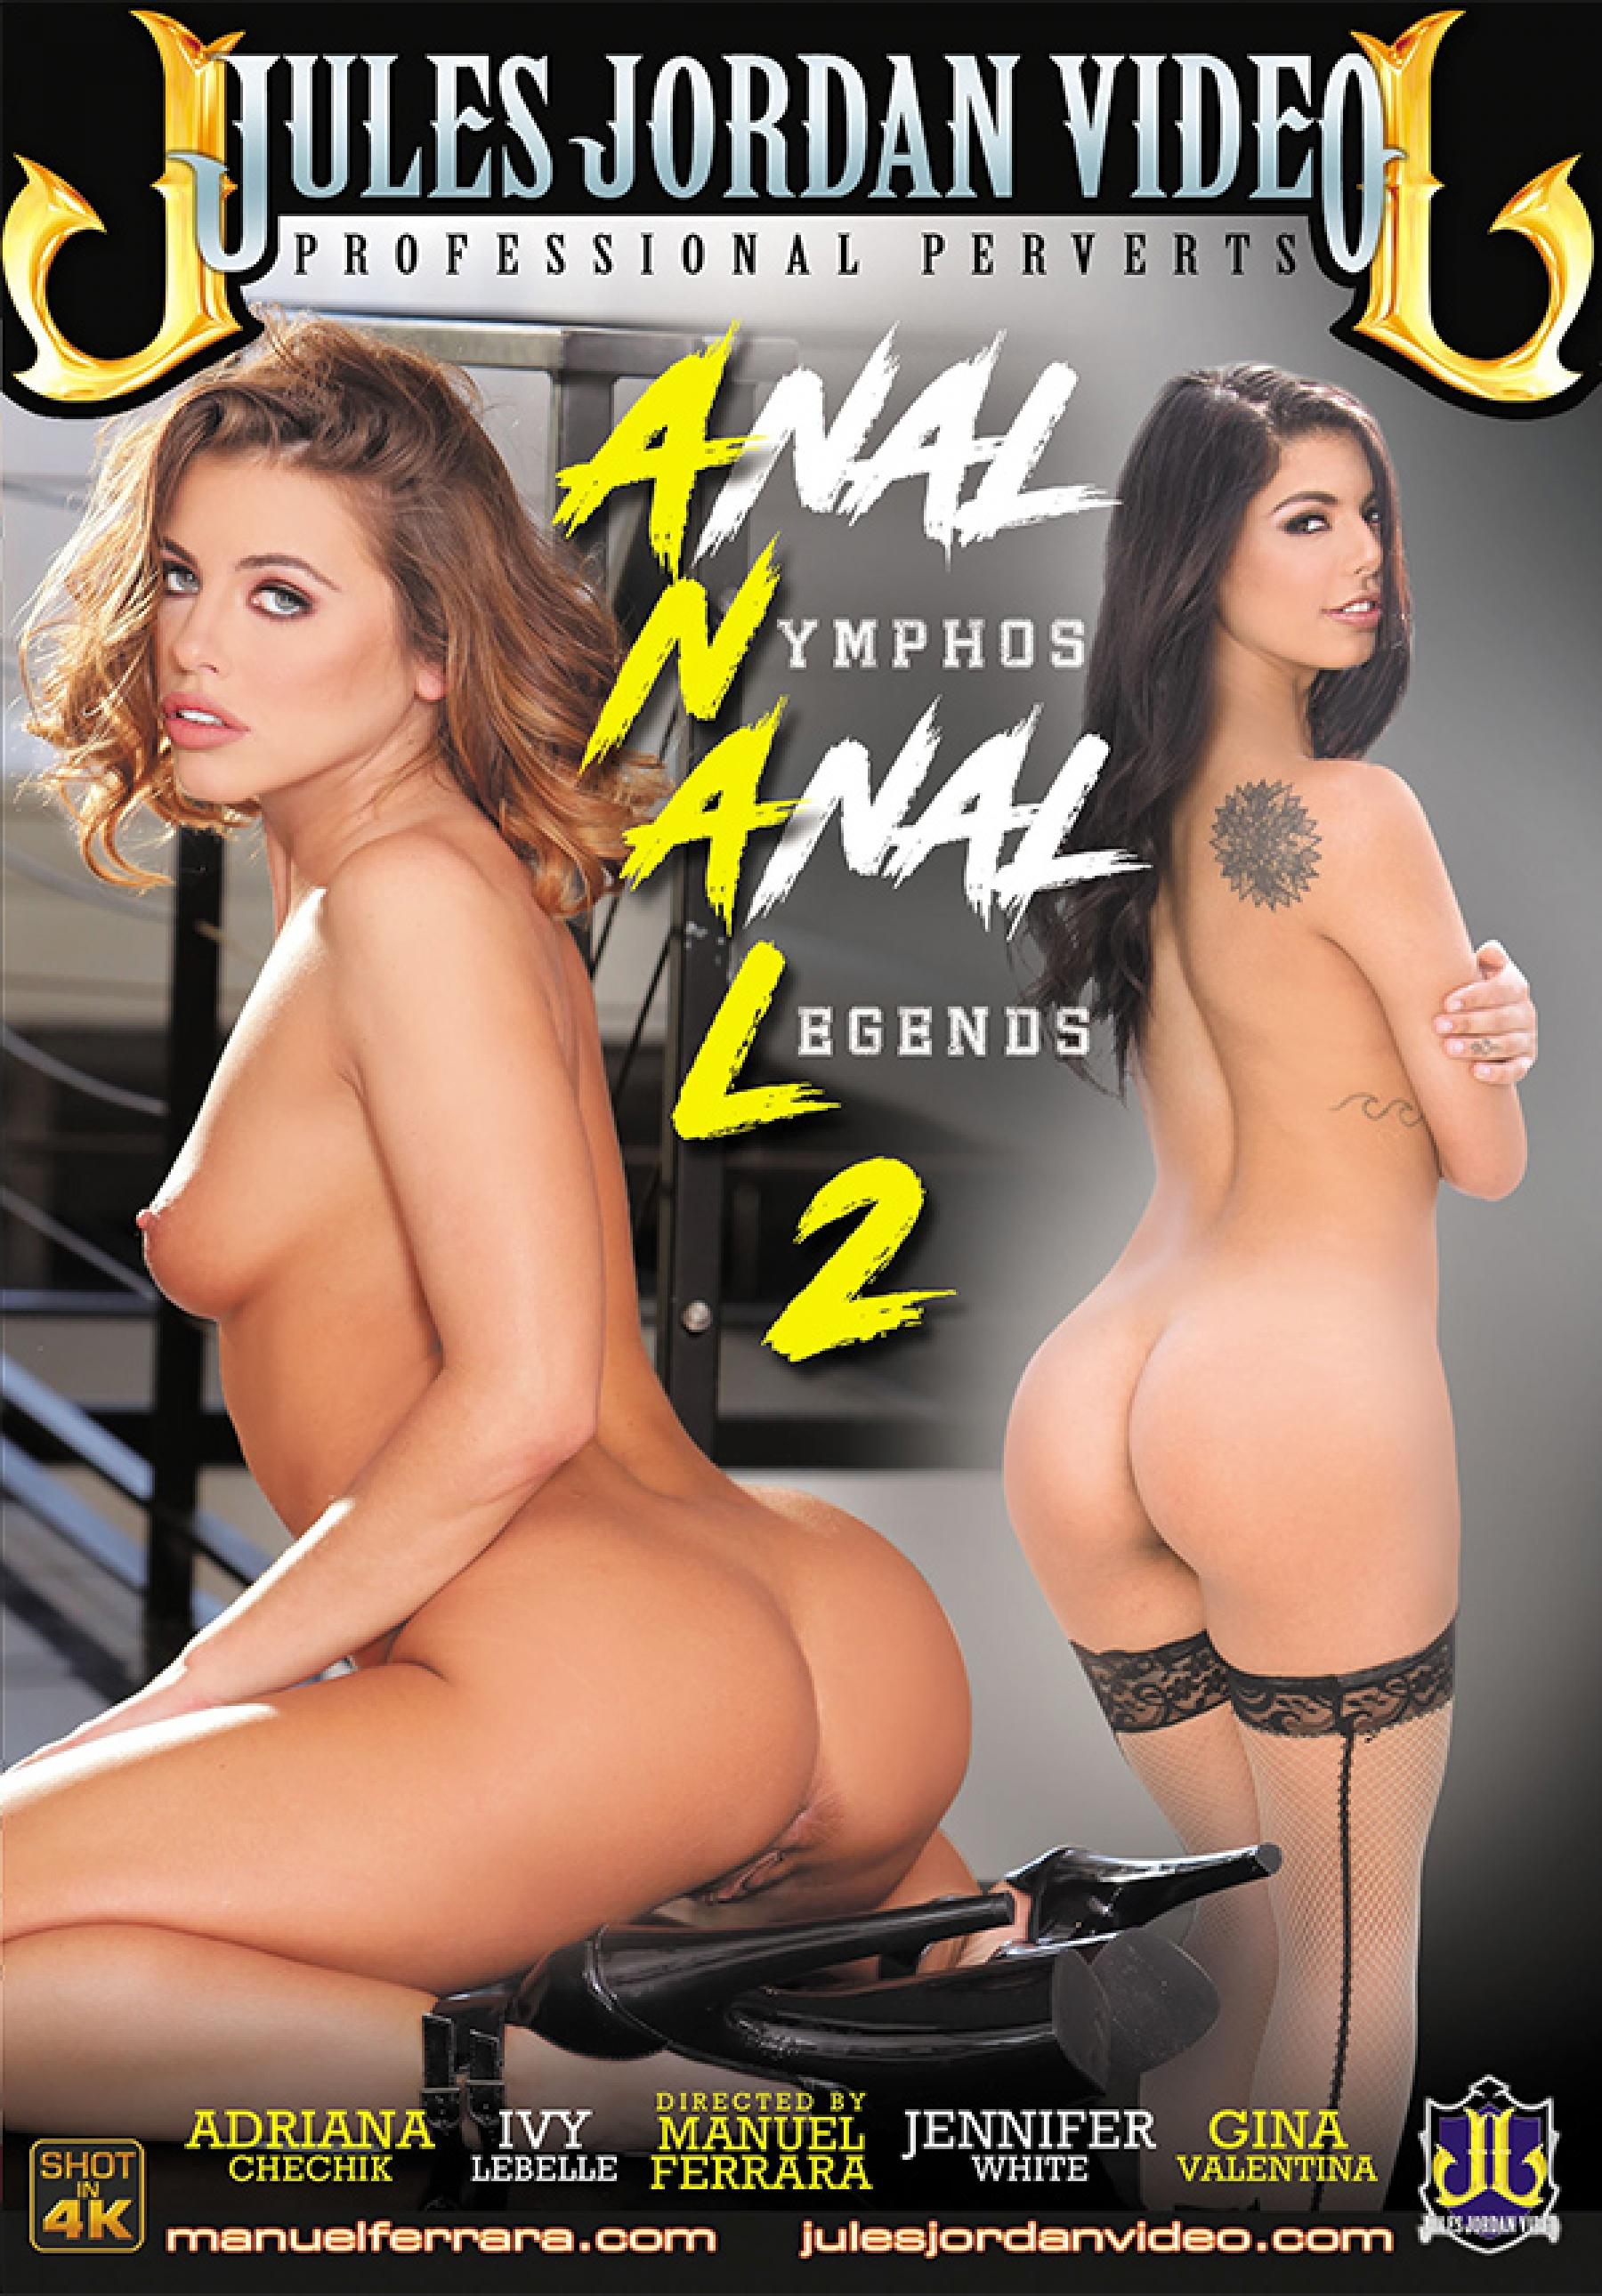 anal nymphos anal legends #2